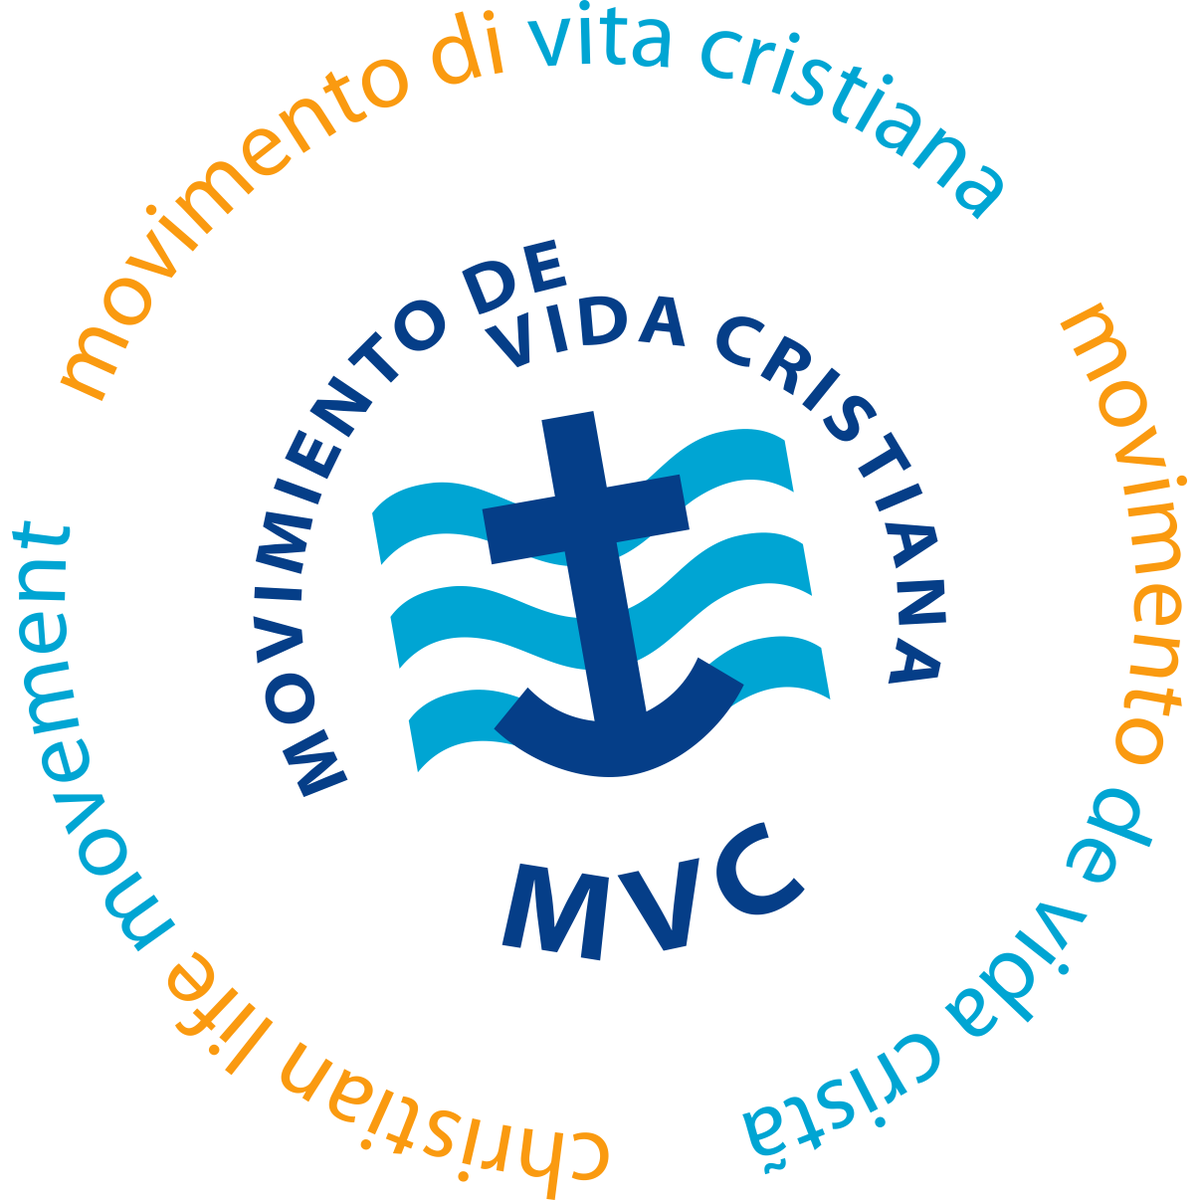 Movimiento de Vida Cristiana.